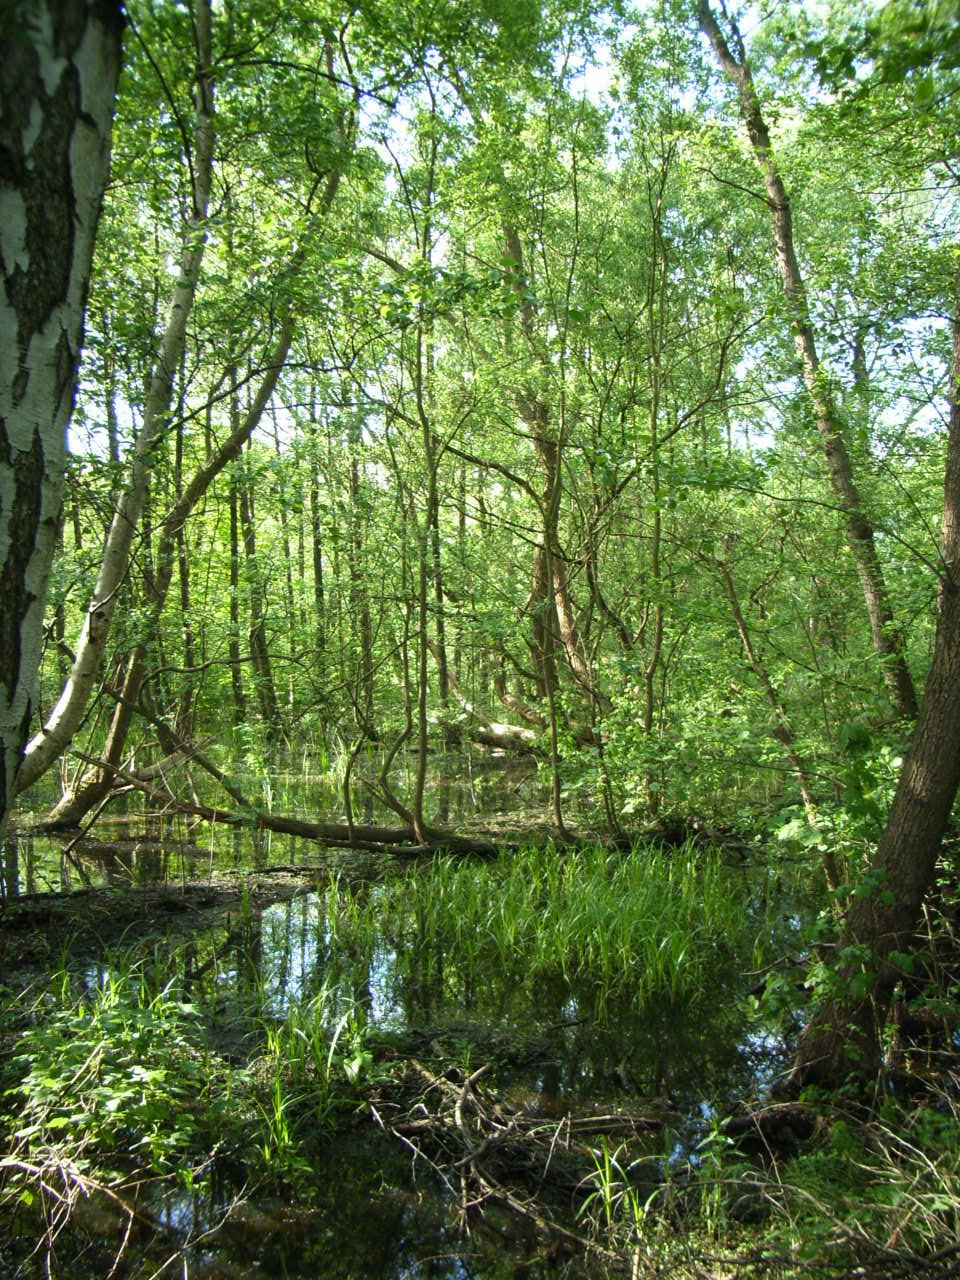 Biotop Hamburg file biotop und erdfall in hamburg groß flottbek jpeg wikimedia